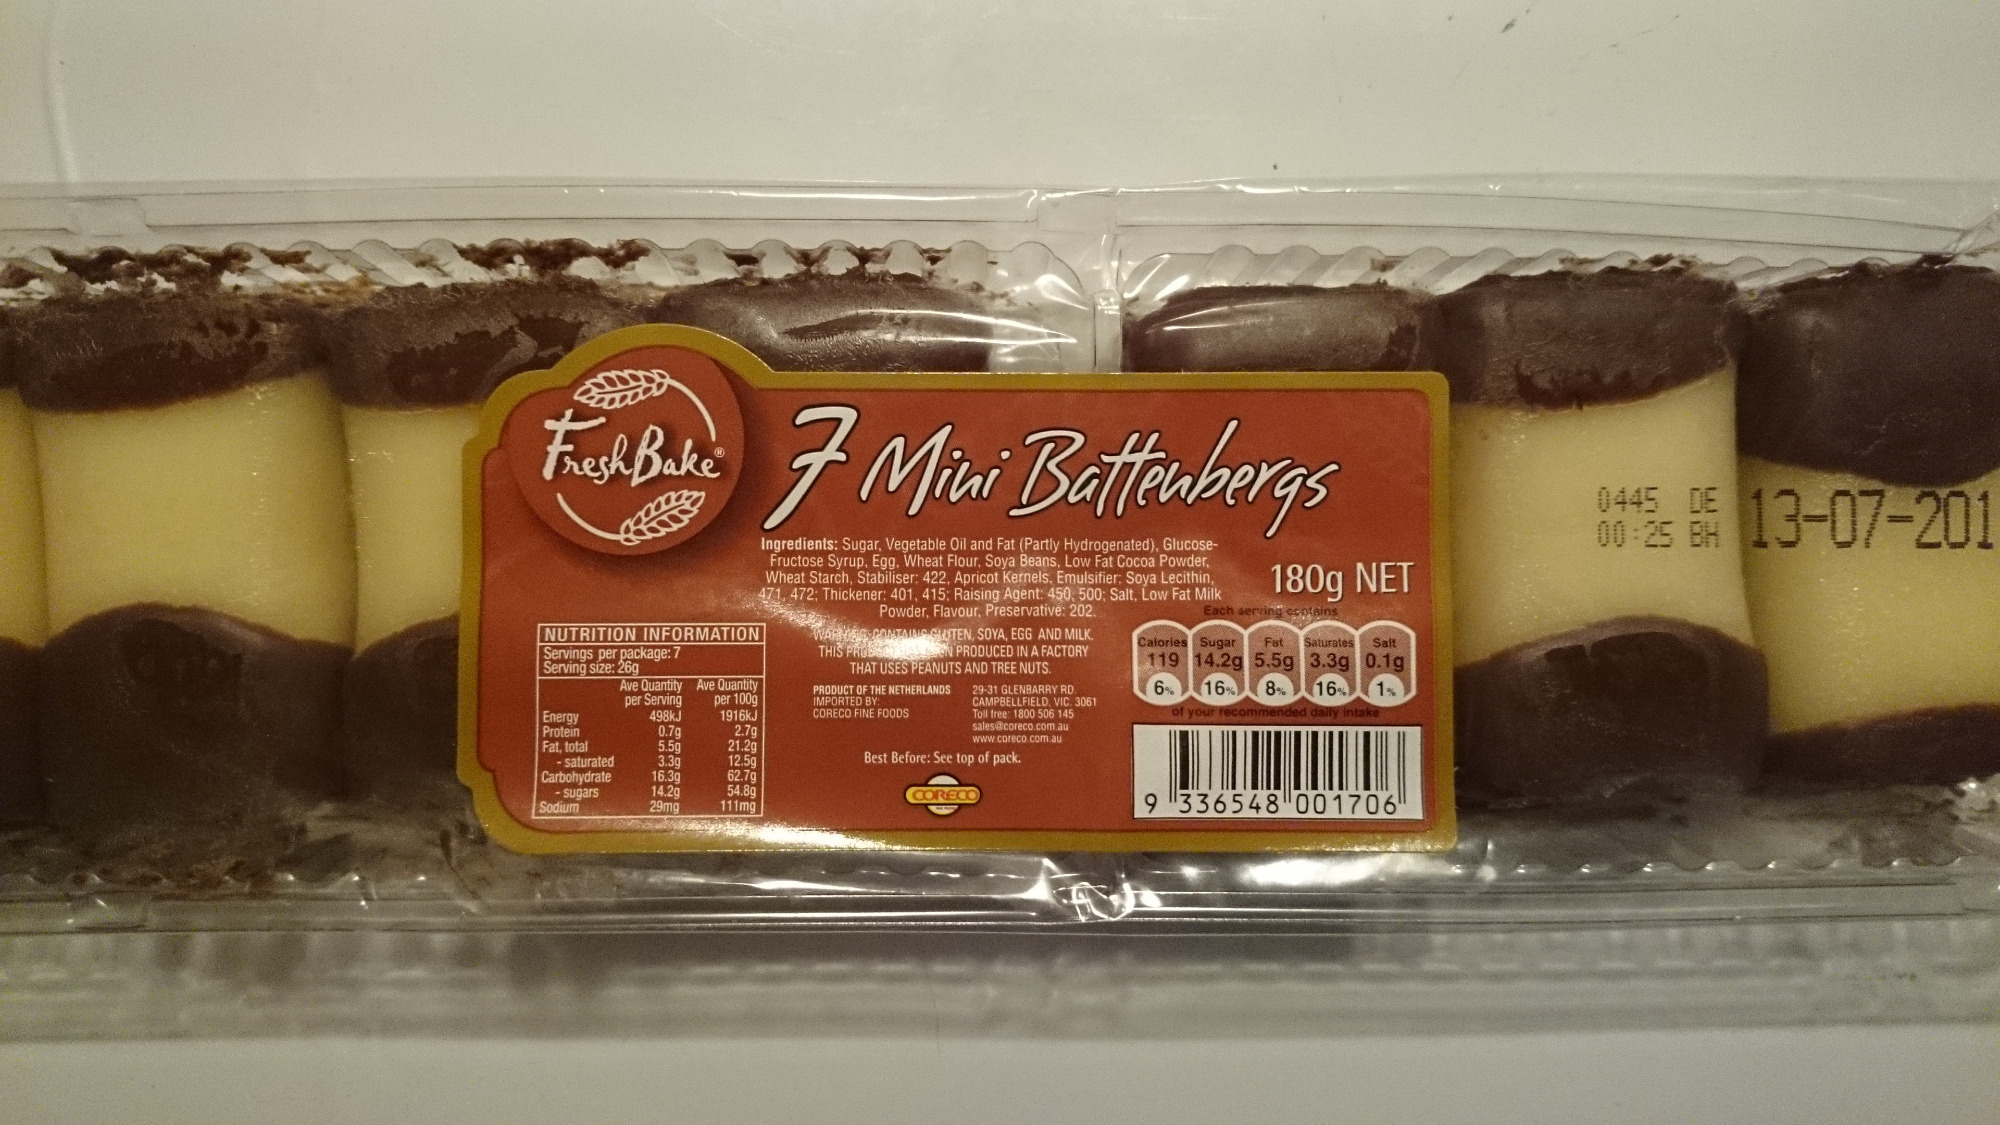 7 Mini Battengergs - Product - en